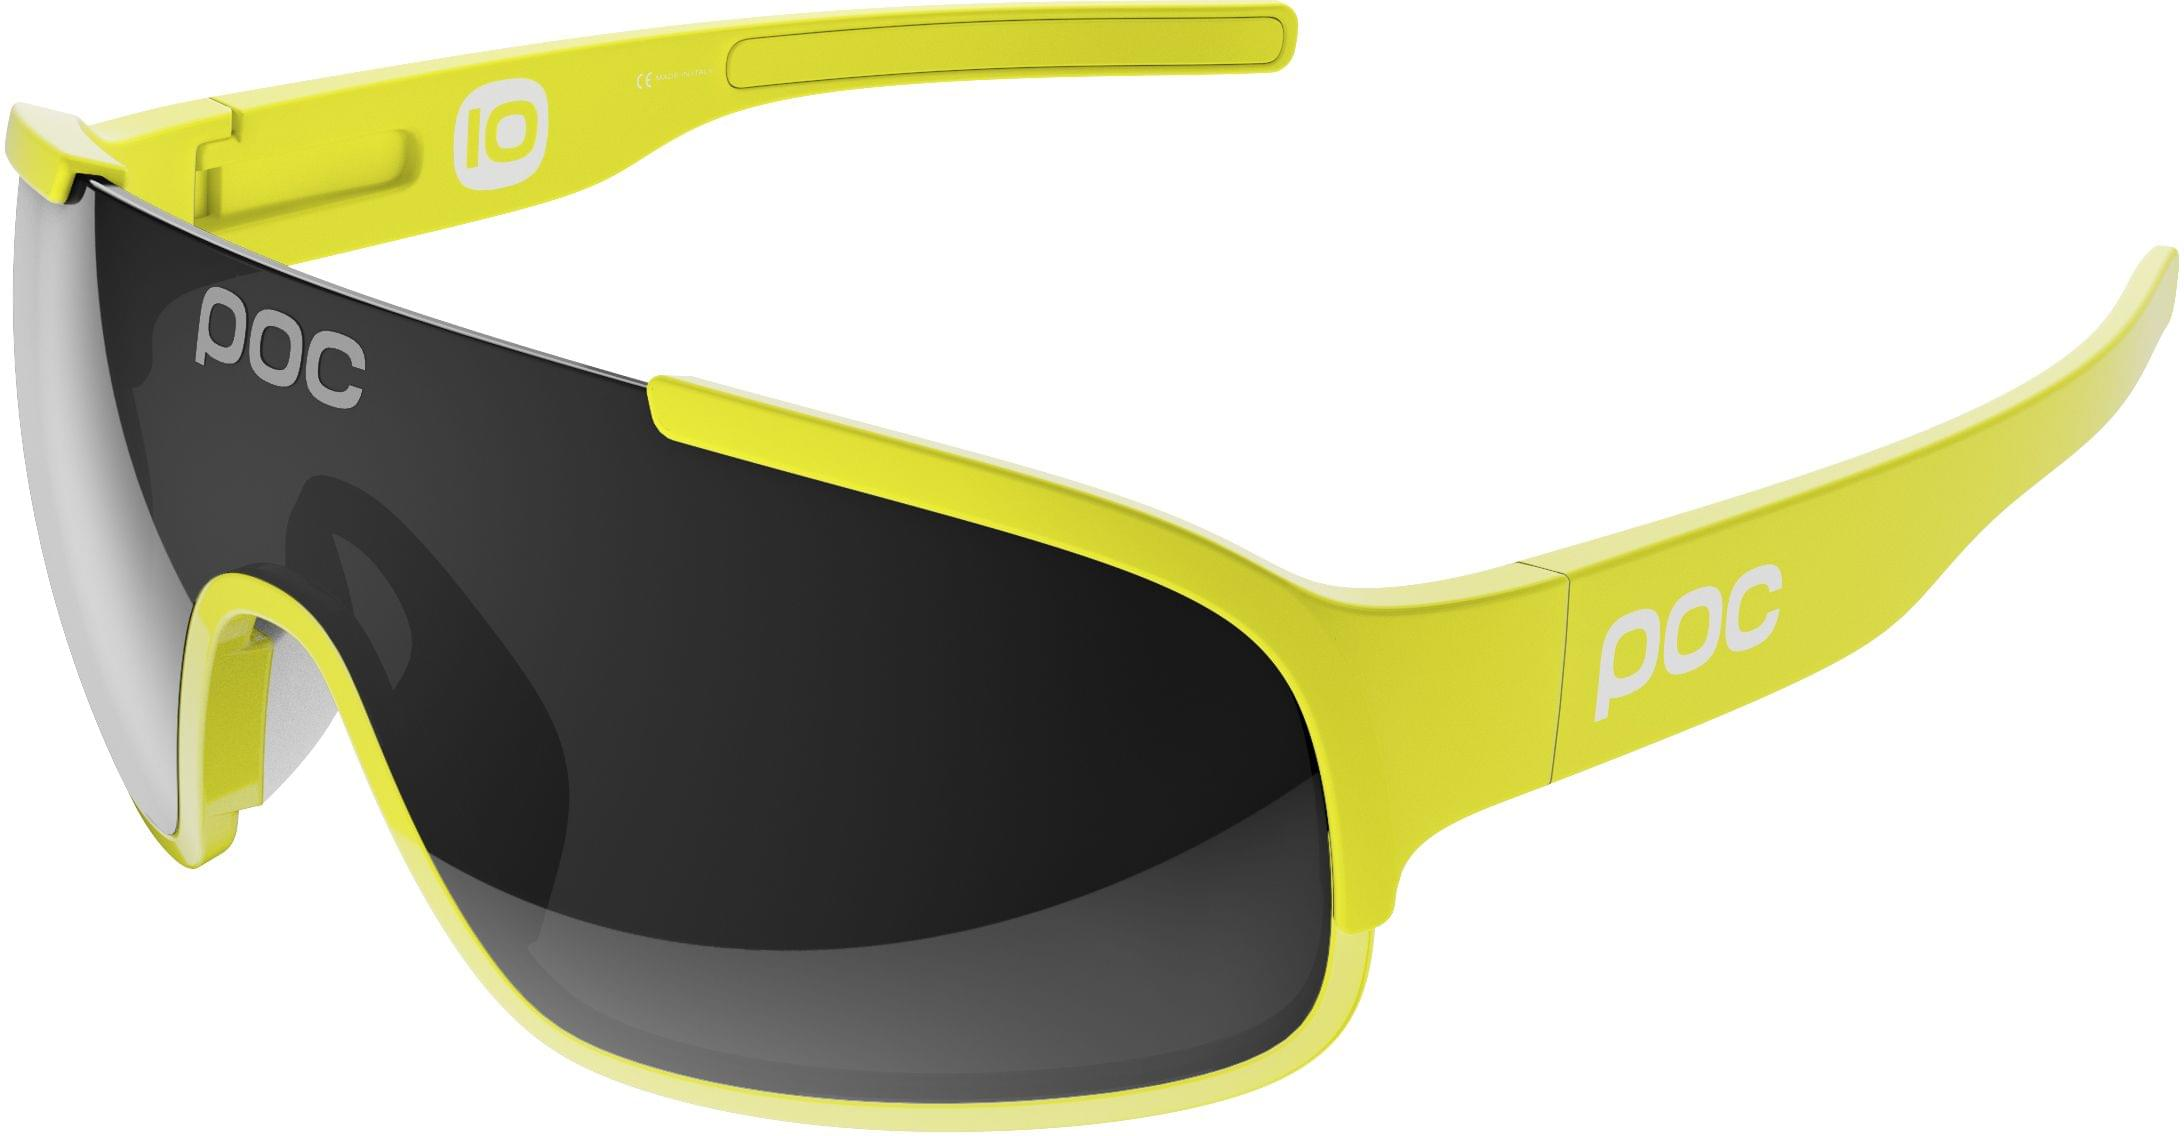 2f1f8350135 Sluneční brýle POC Crave - unobtanium yellow grey - Ski a Bike ...